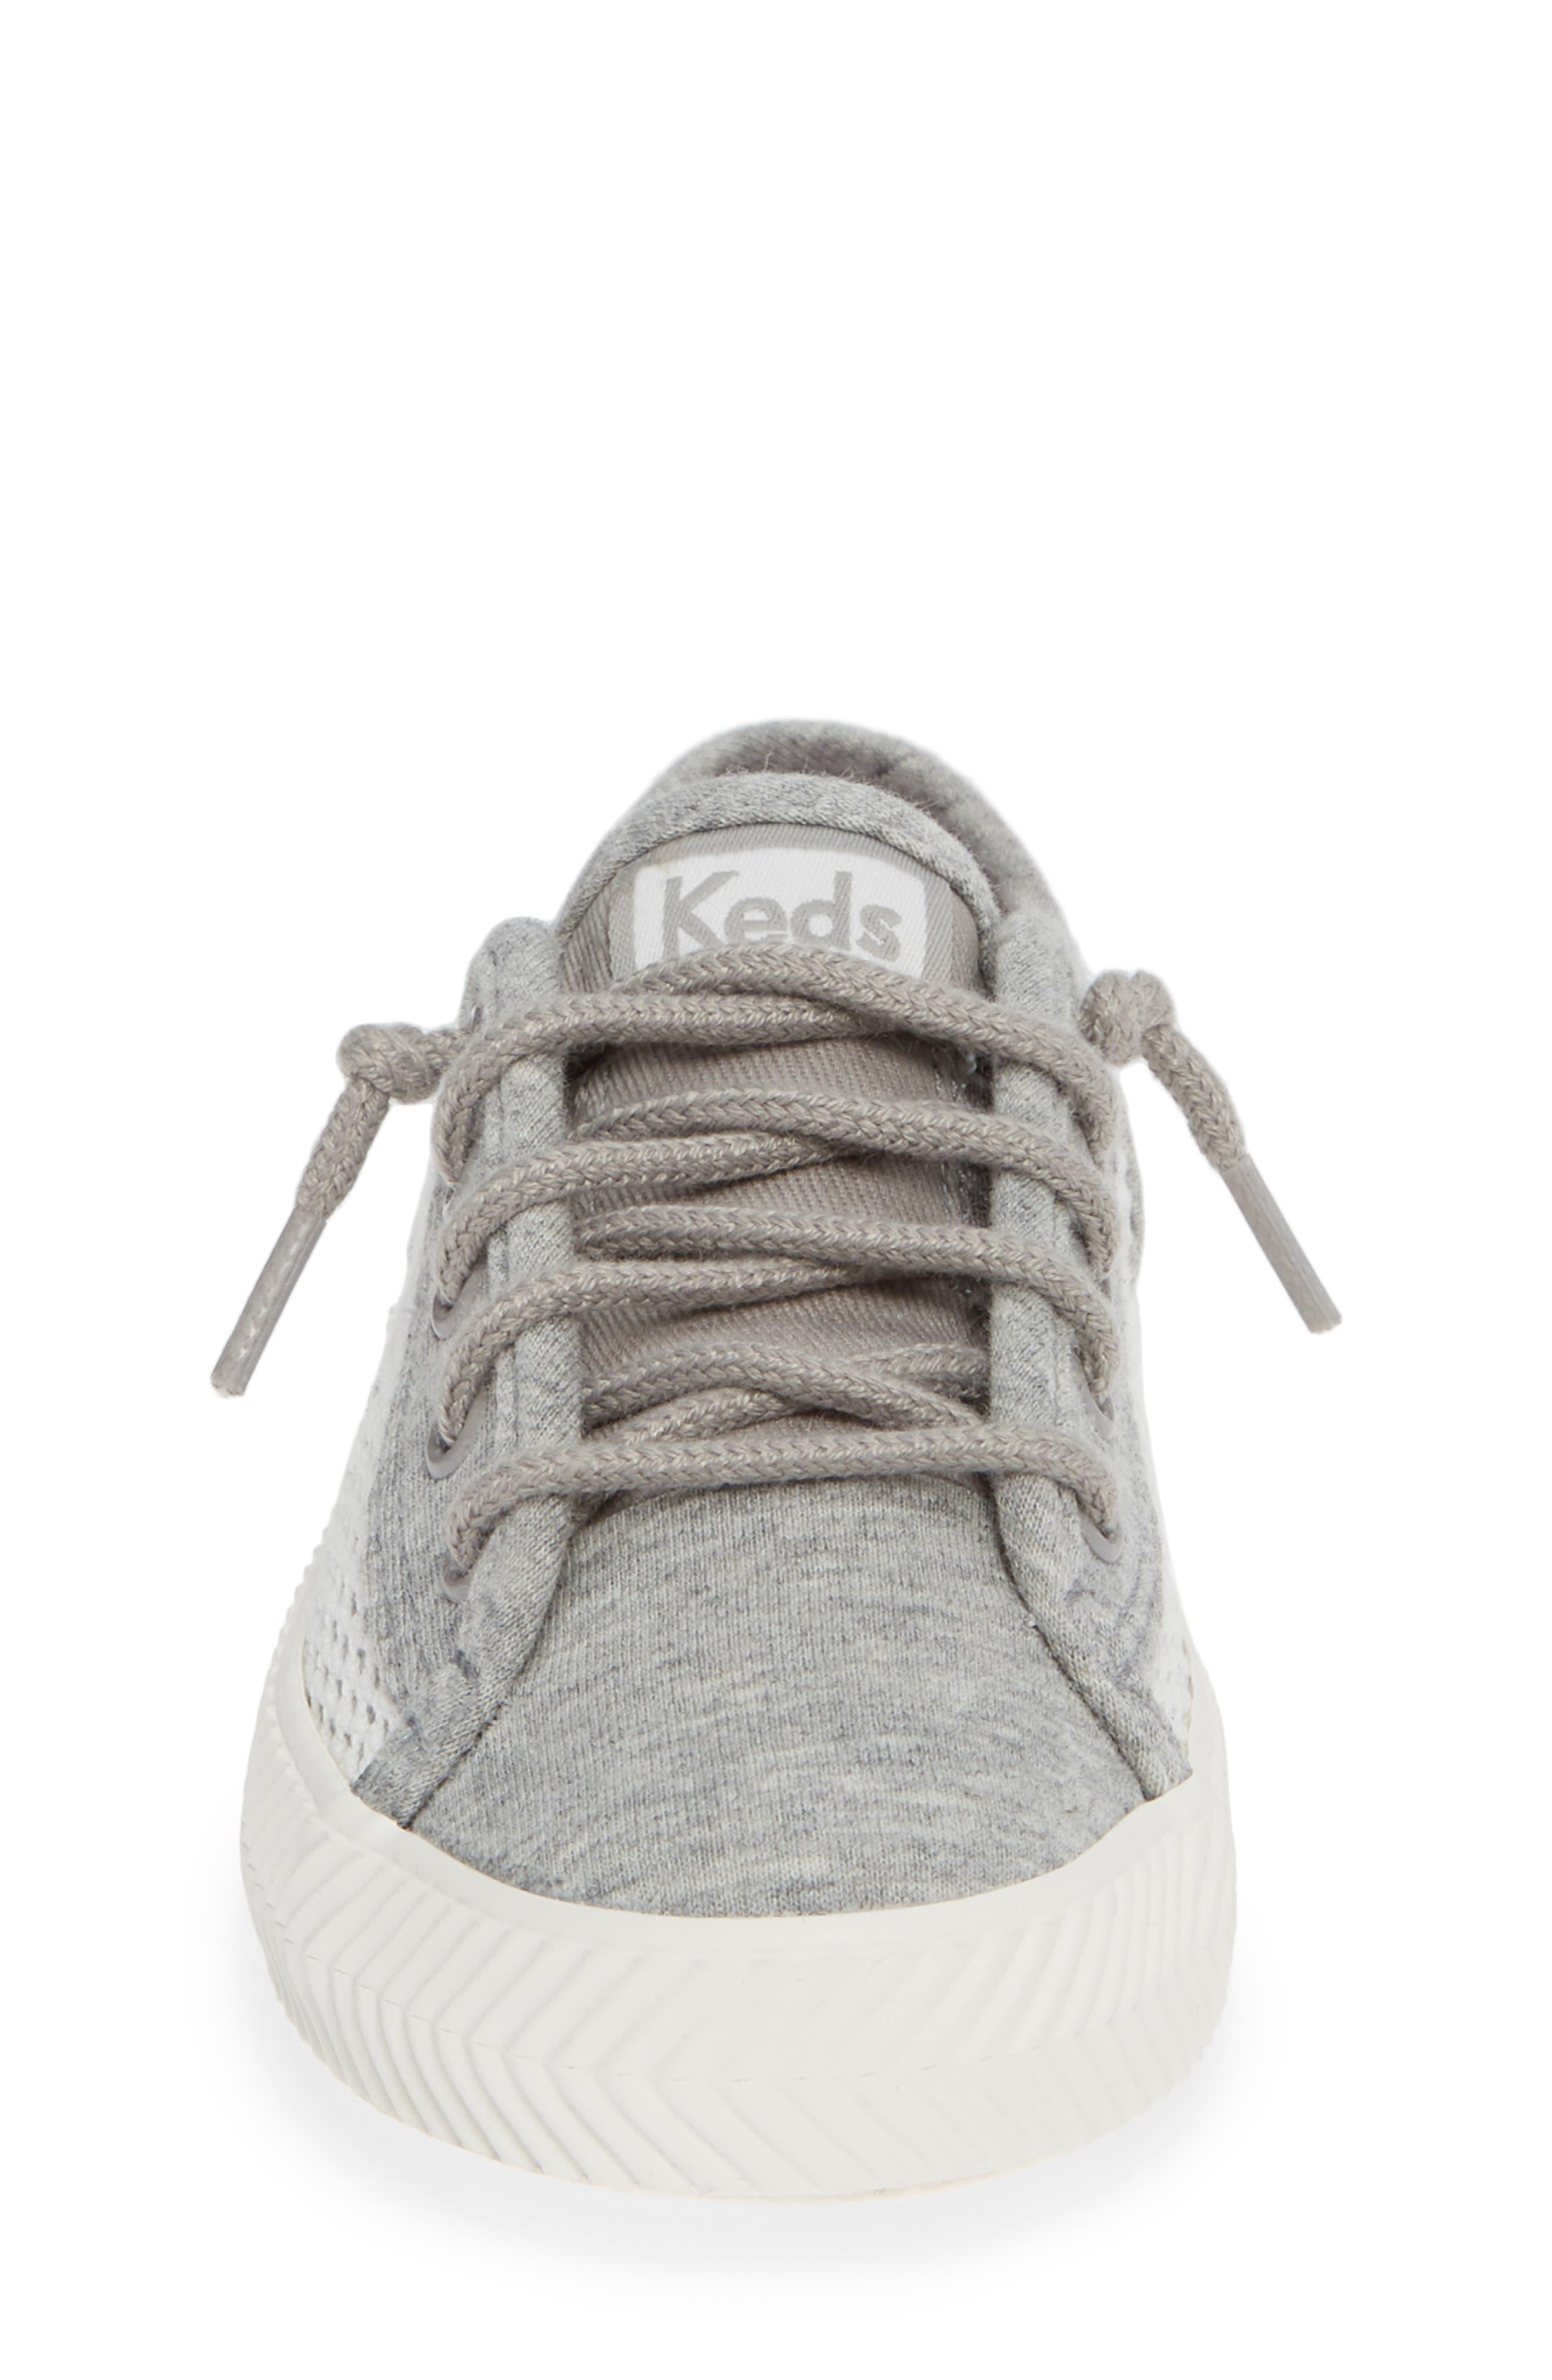 Kickstart Herringbone Mesh Sneaker,                             Alternate thumbnail 4, color,                             050